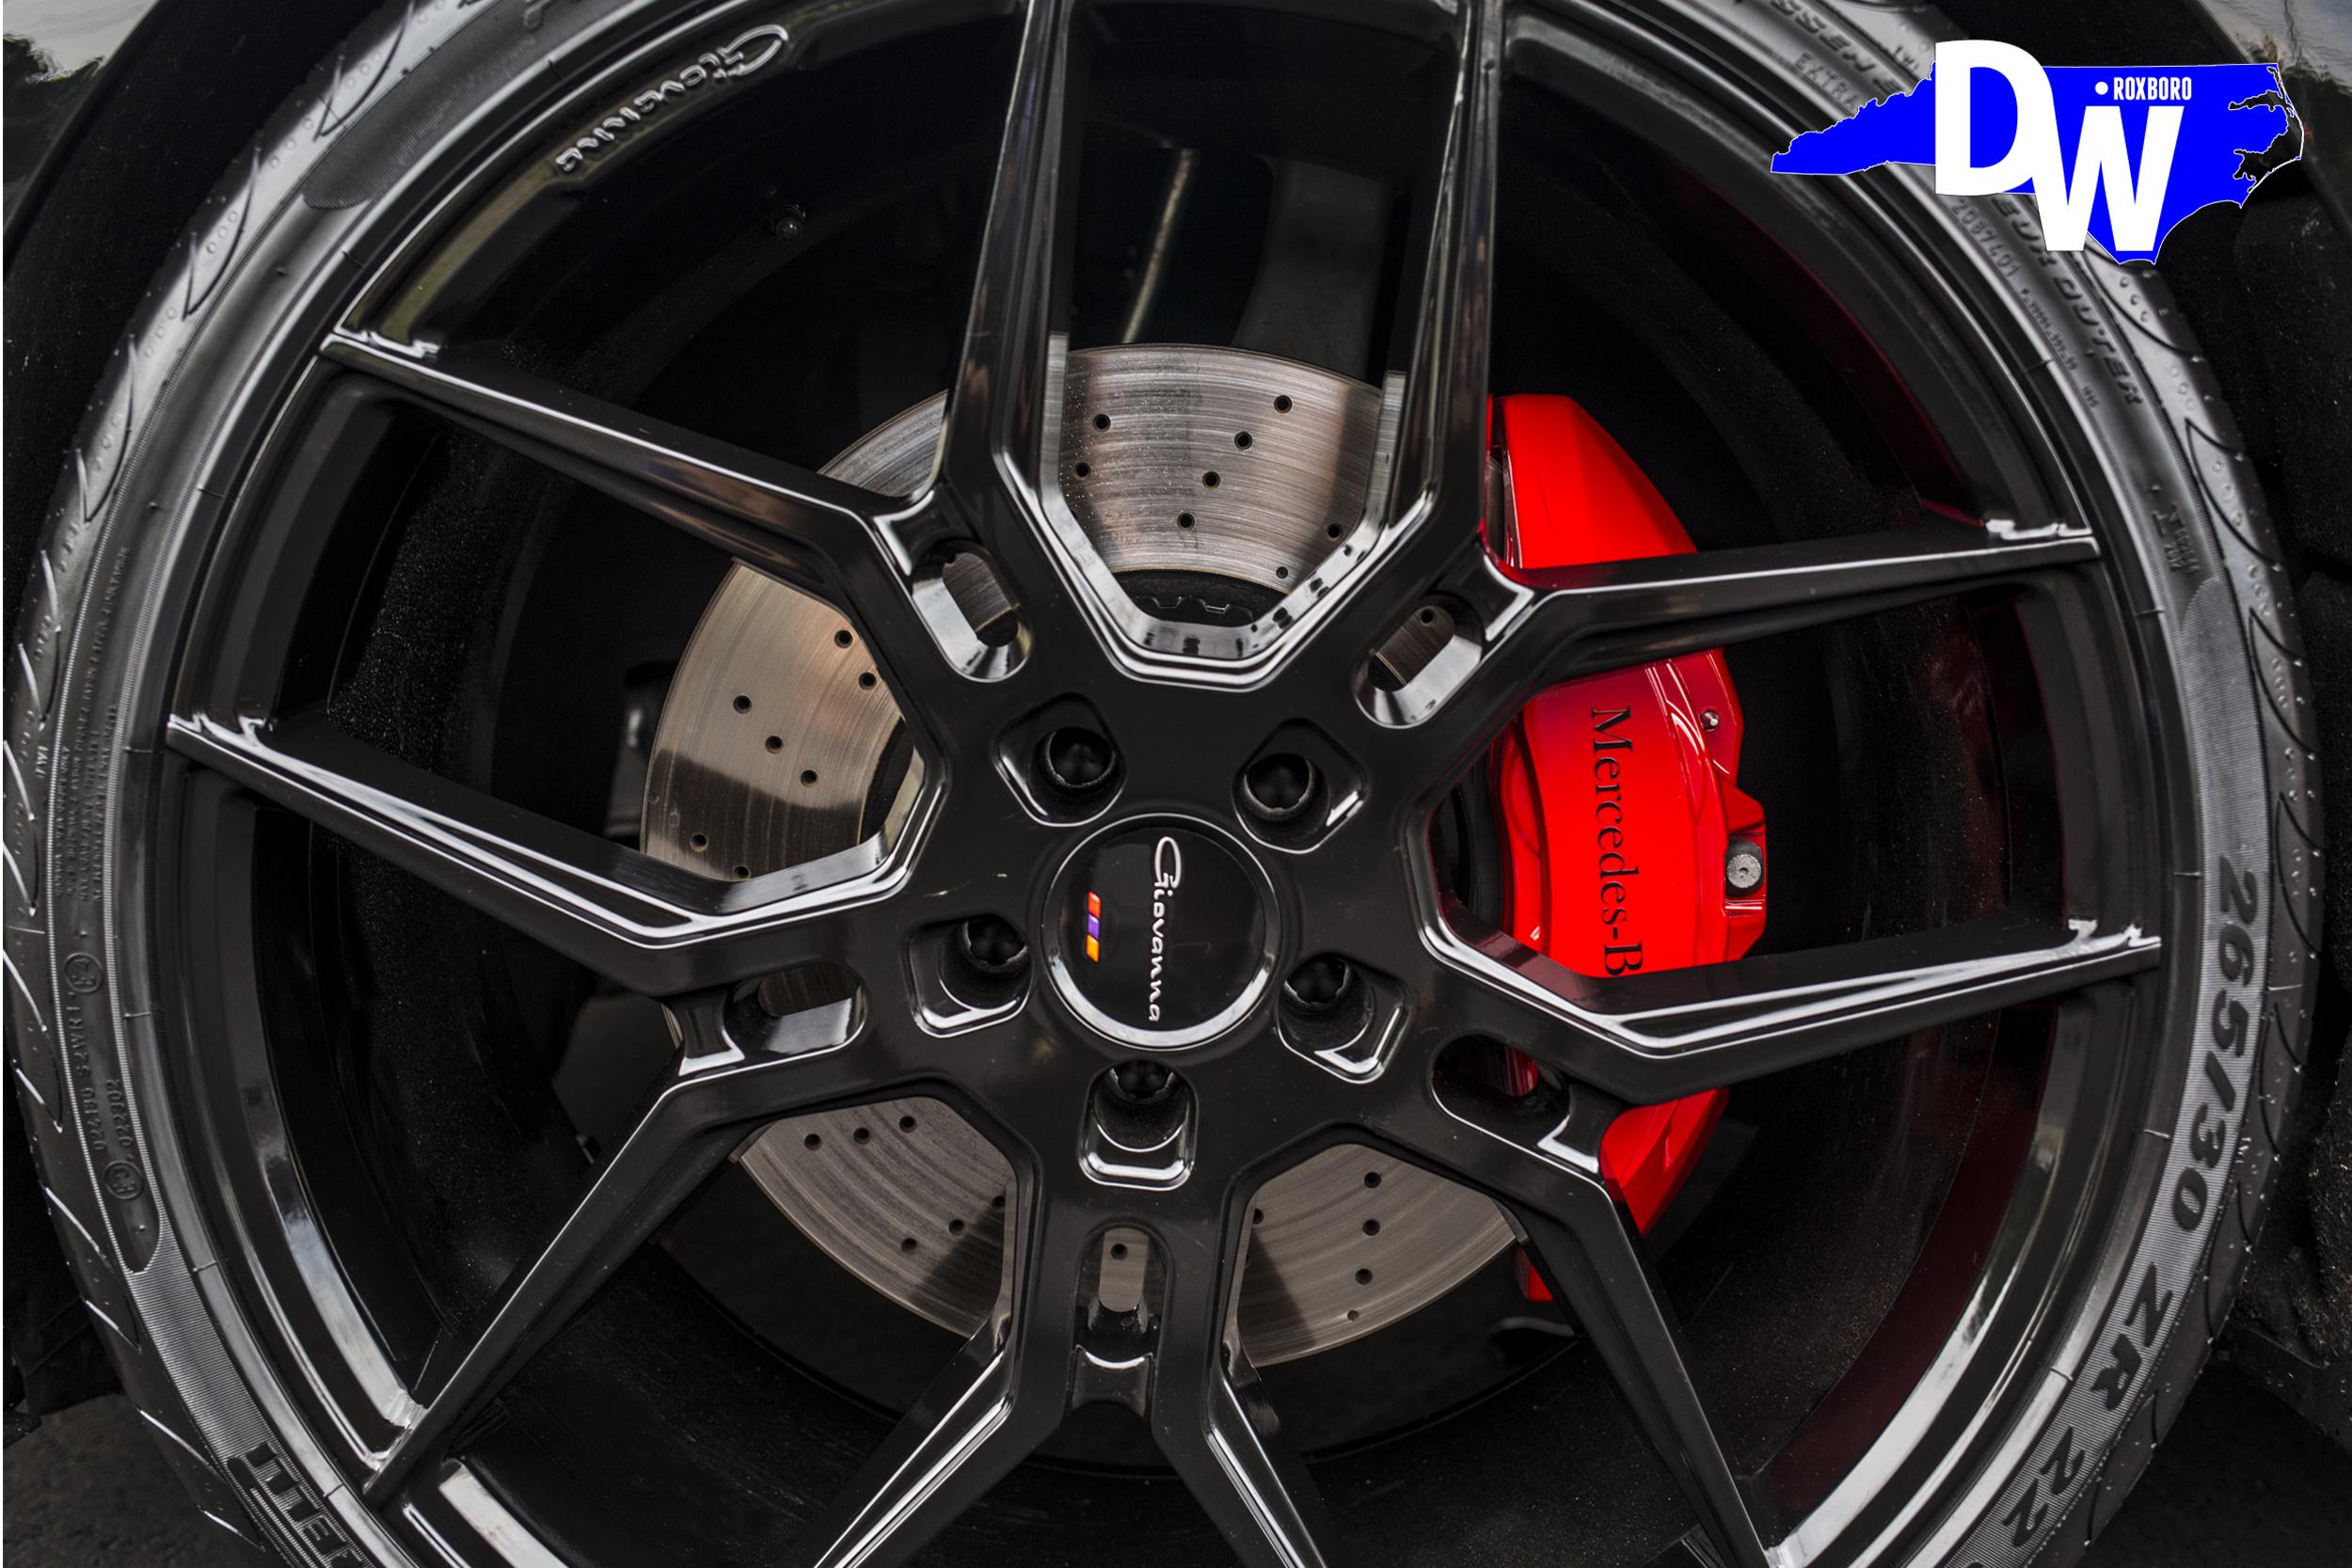 DW-s550-coupe-Giovanna-Wheels.jpg